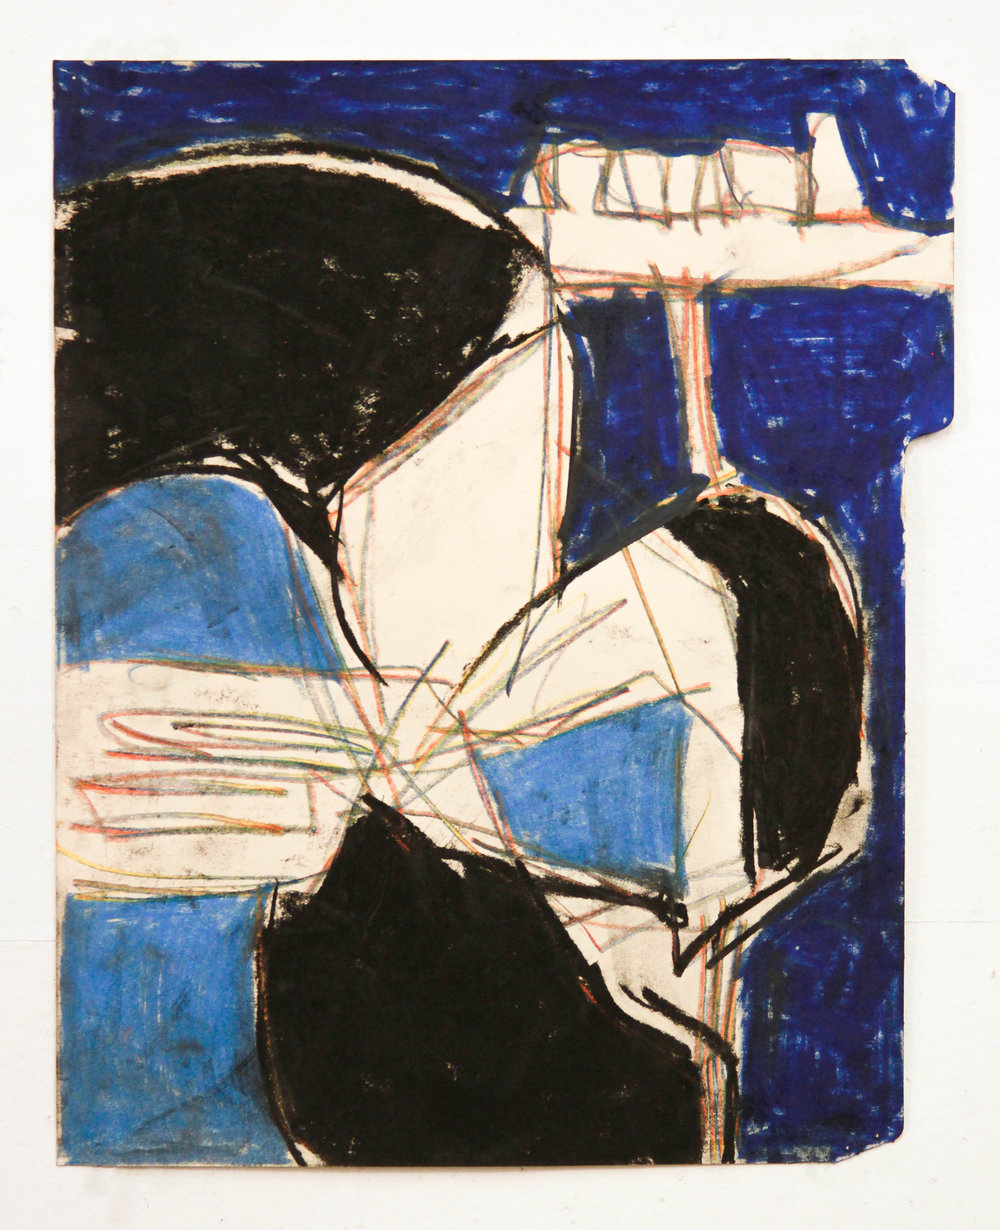 Grade School Blues, Demetri Espinosa